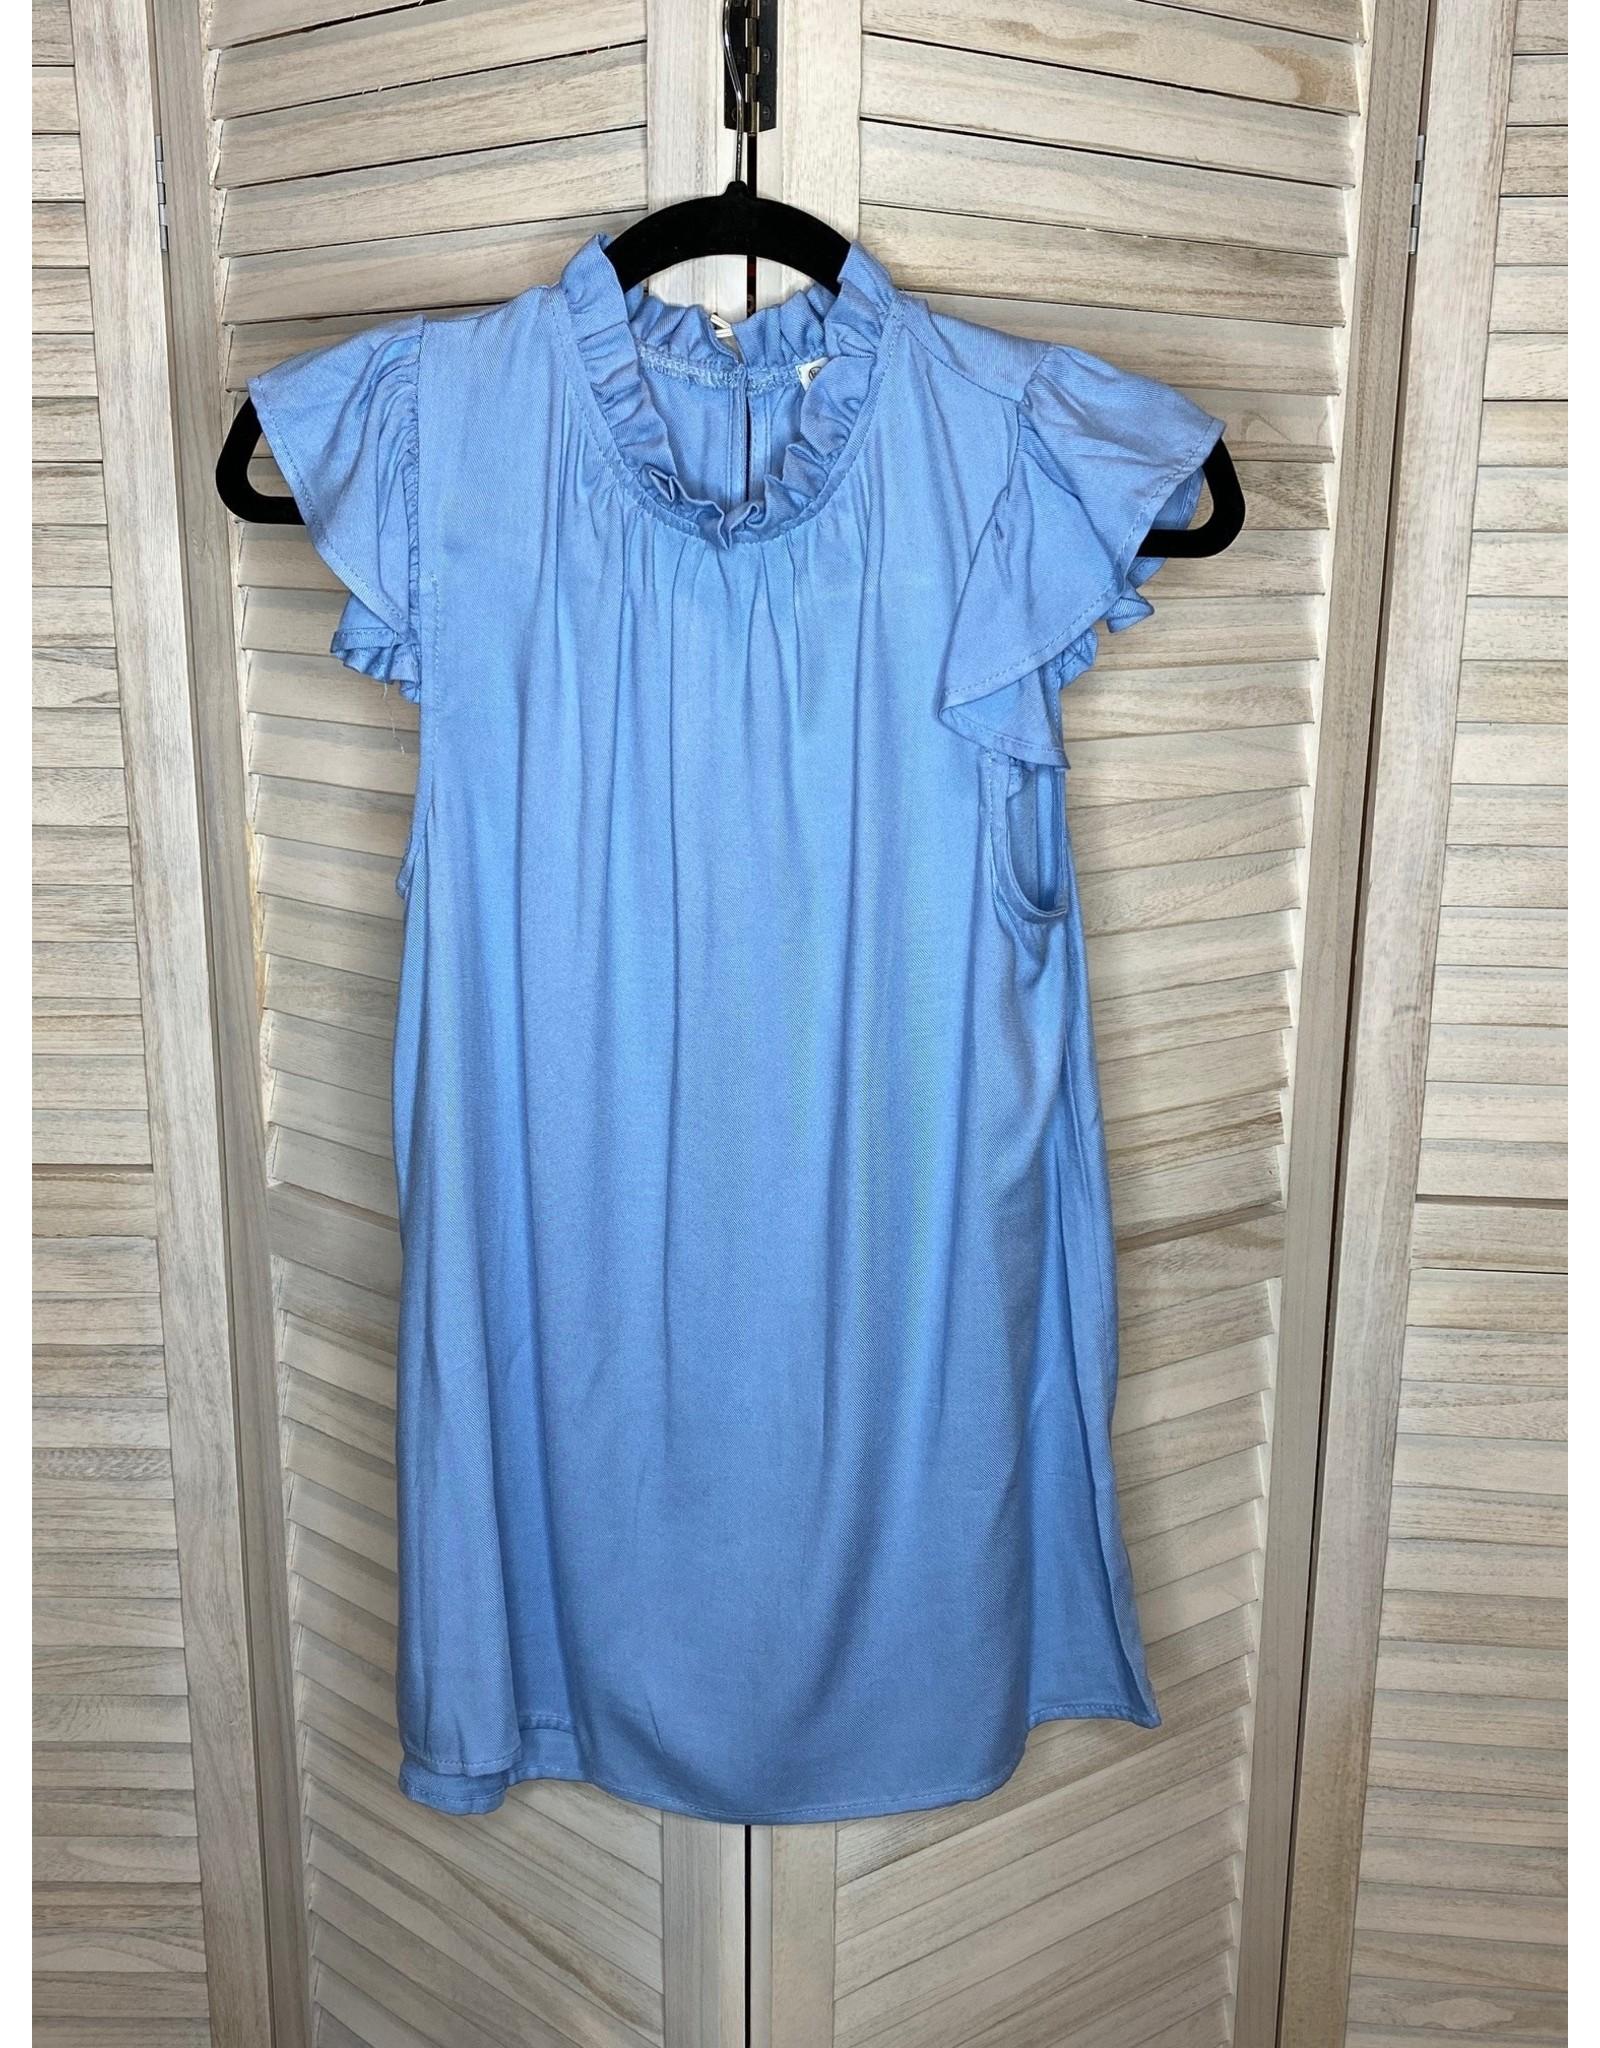 FSL Apparel Light Blue Ruffle Neck and Sleeve Top